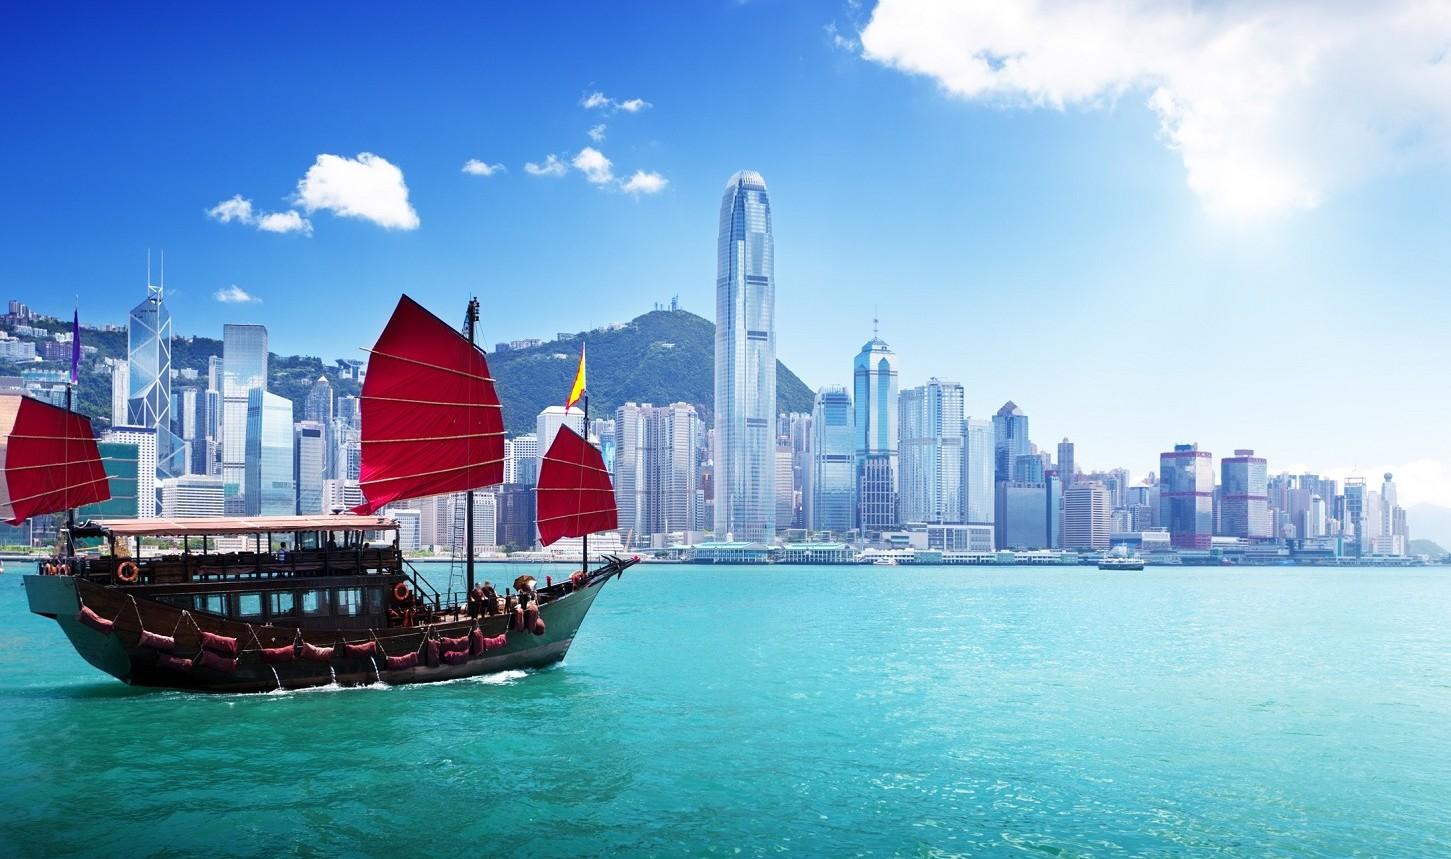 Le città più visitate al mondo. Hong Kon